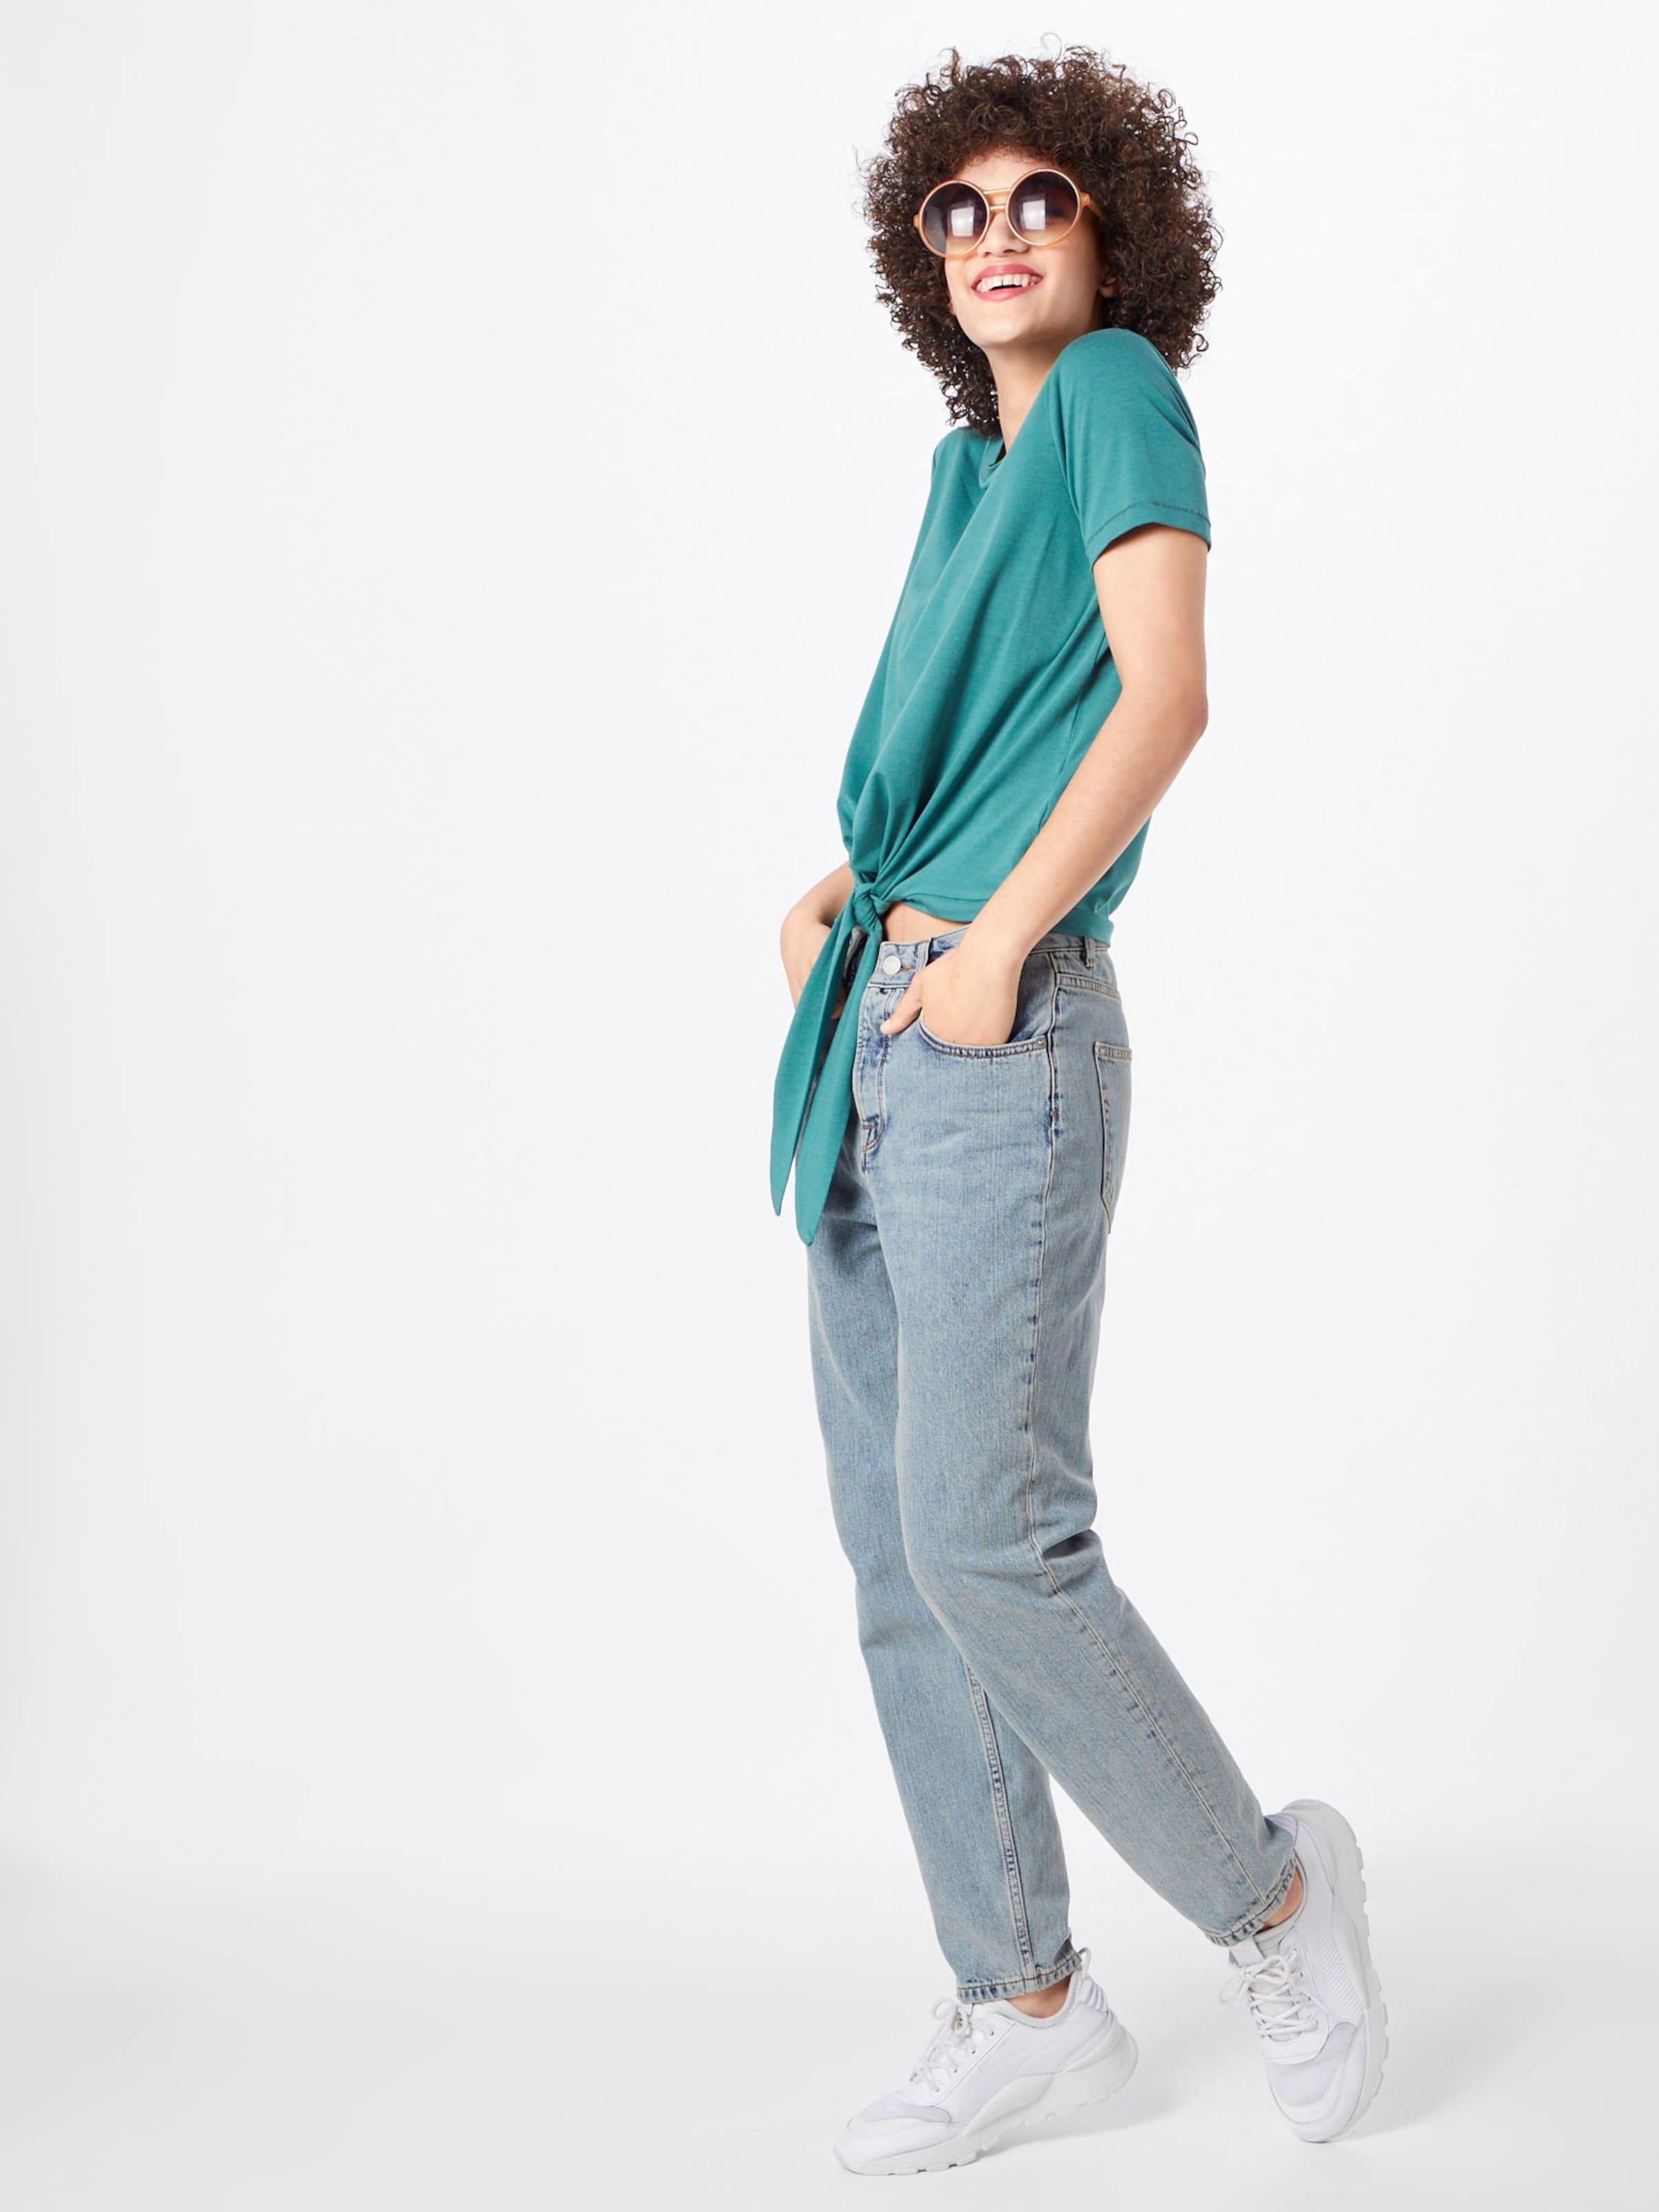 Shirt Pastellblau Shirt 'stephanie' Object In Object c3q4RLA5j